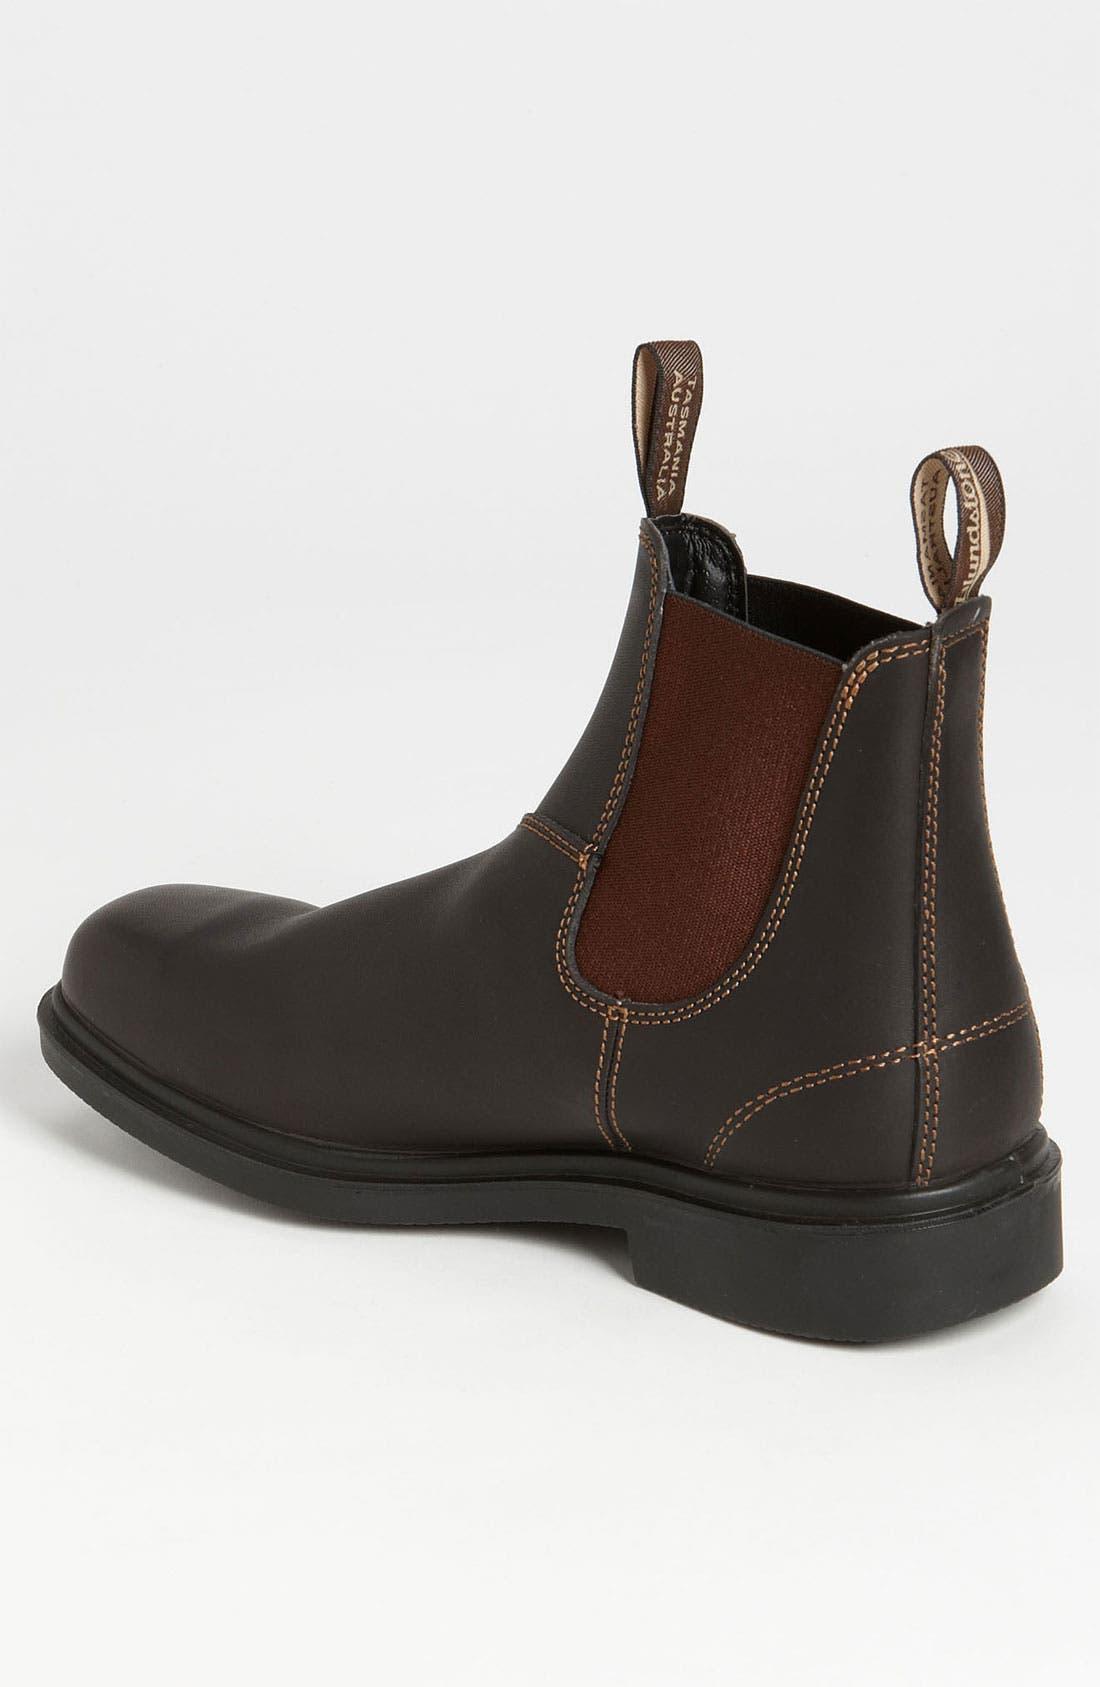 Footwear Chelsea Boot,                             Alternate thumbnail 2, color,                             Stout Brown